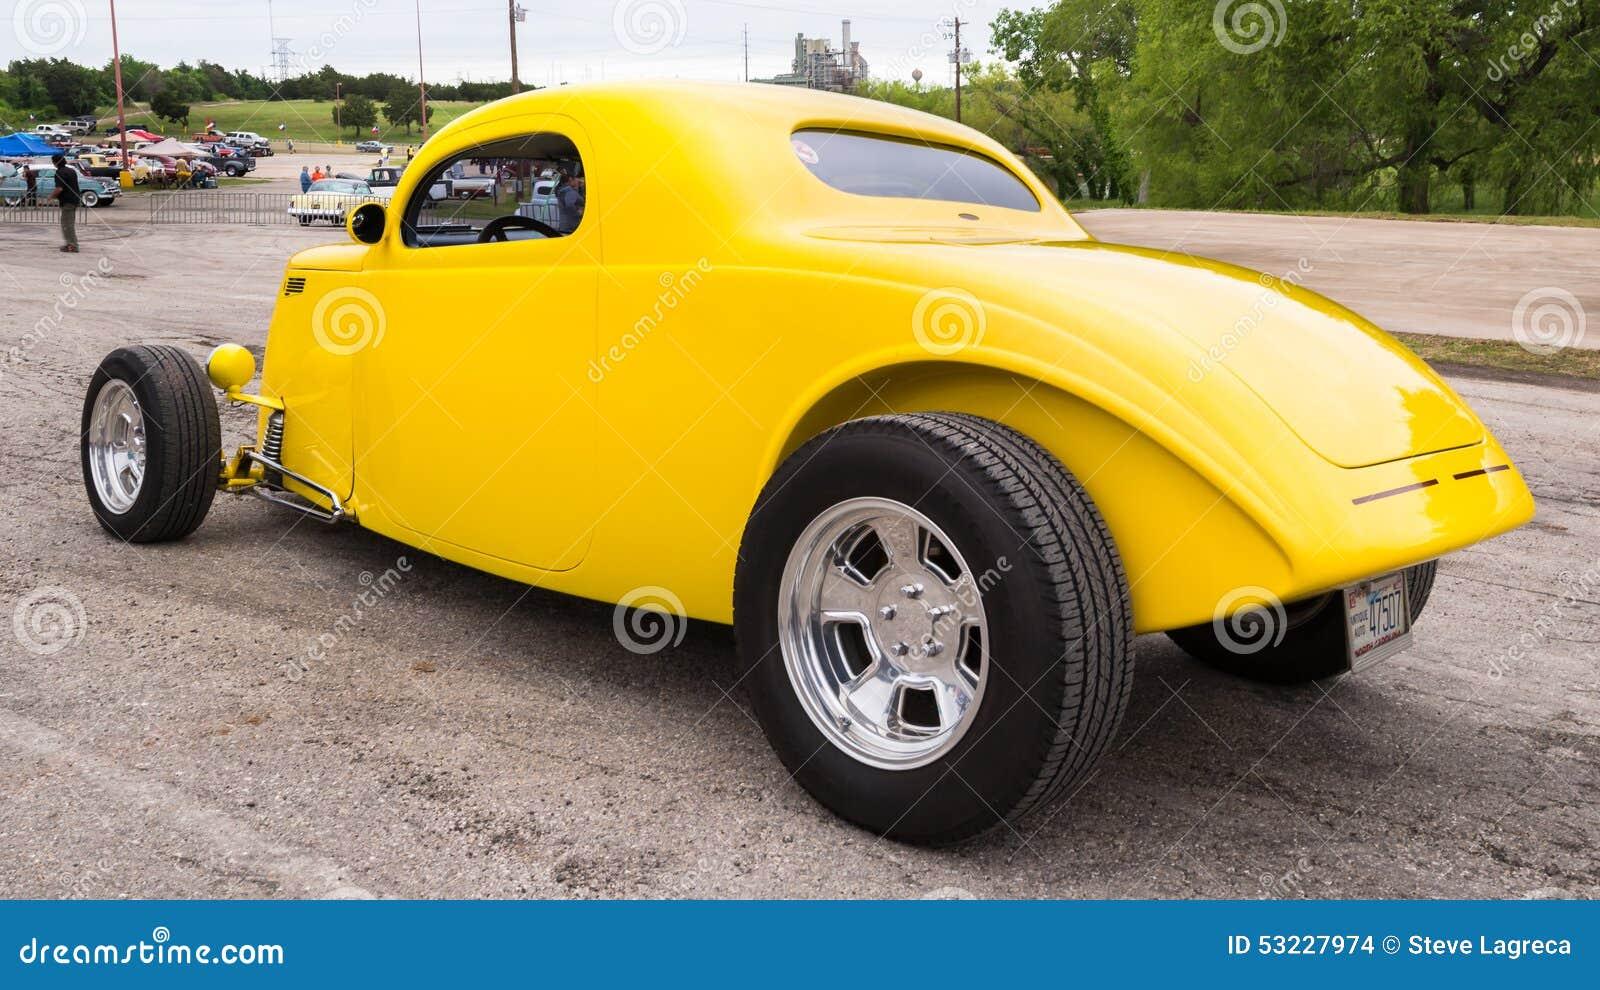 Used Cars Round Rock Tx | Upcomingcarshq.com